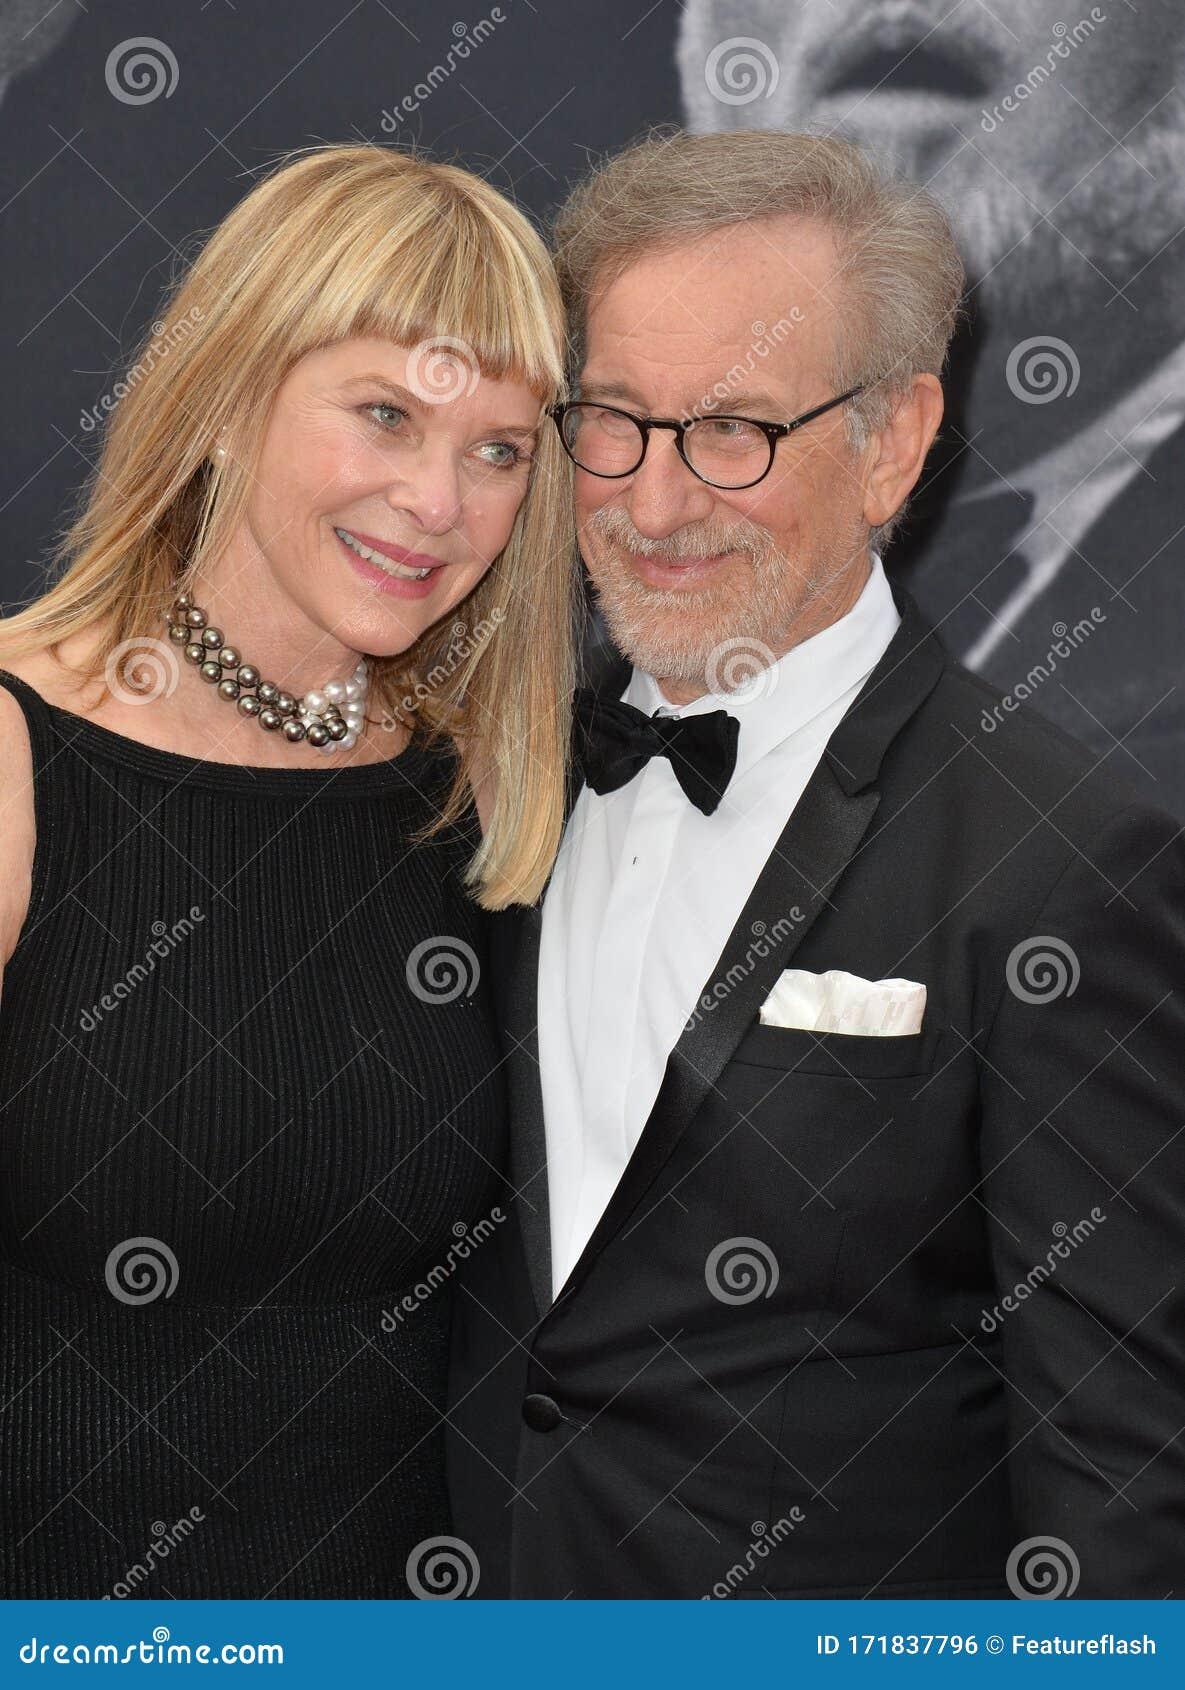 Steven Spielberg Kate Capshaw Editorial Photo Image Of Actress Tuxedo 171837796